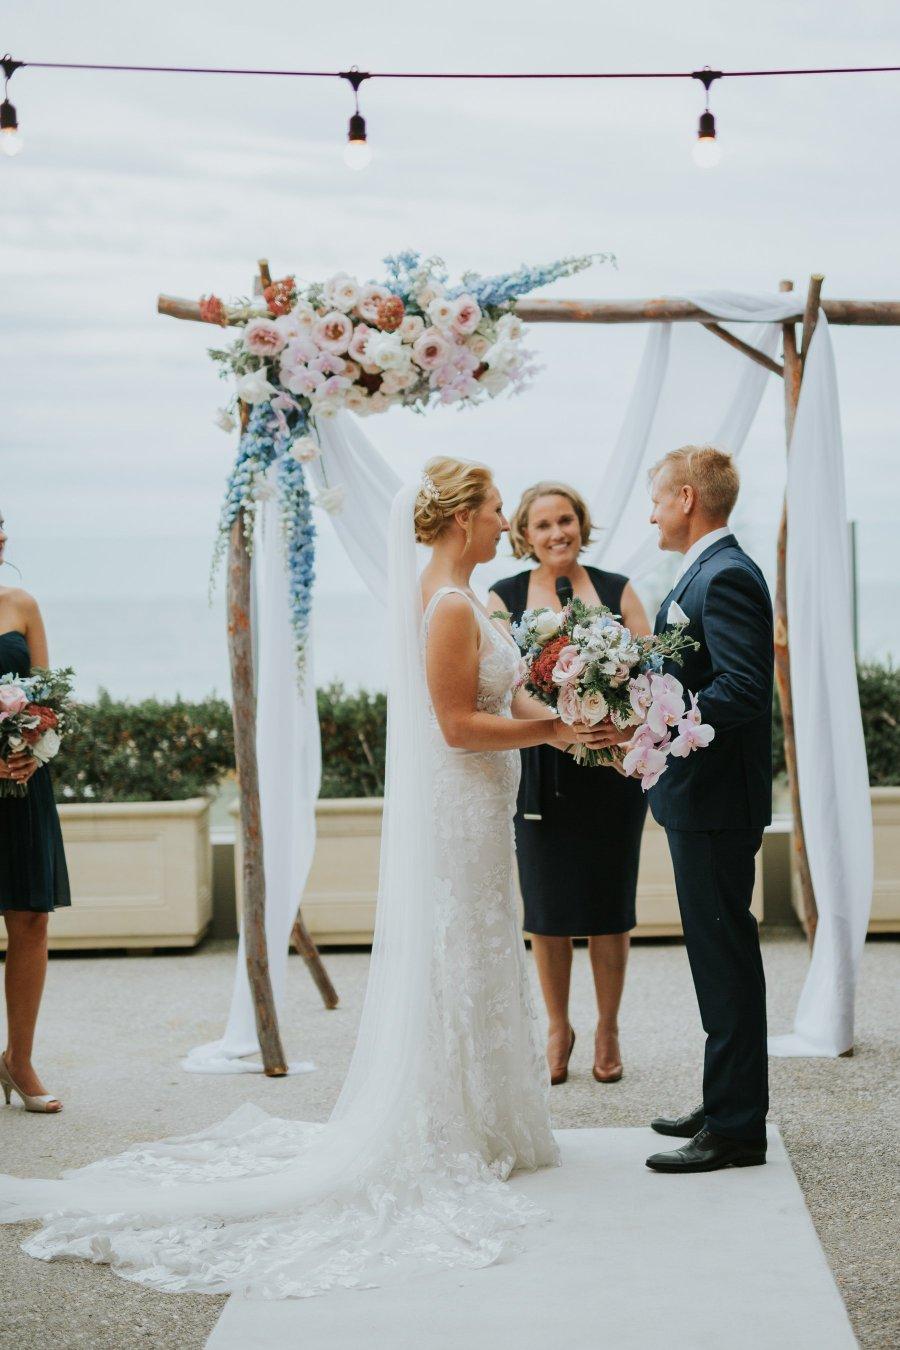 Kate + Graeme | Mindarie Wedding | Ebony Blush Photography | Zoe Theiadore | Perth wedding Photographer104